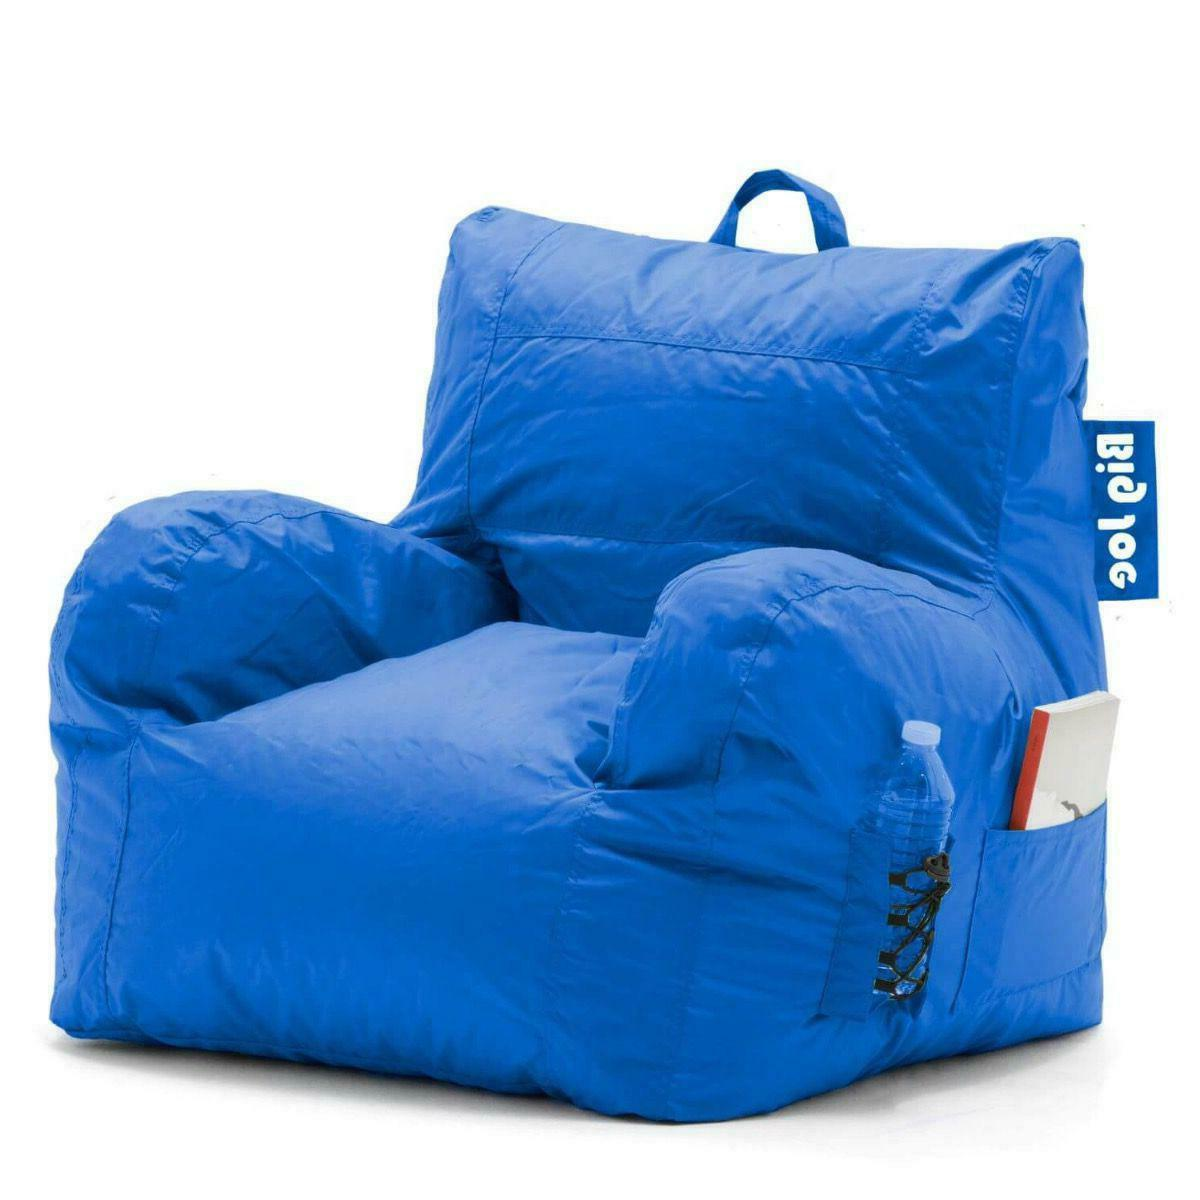 Big Joe Bean Bag Chair Dorm Waterproof Teens Adults